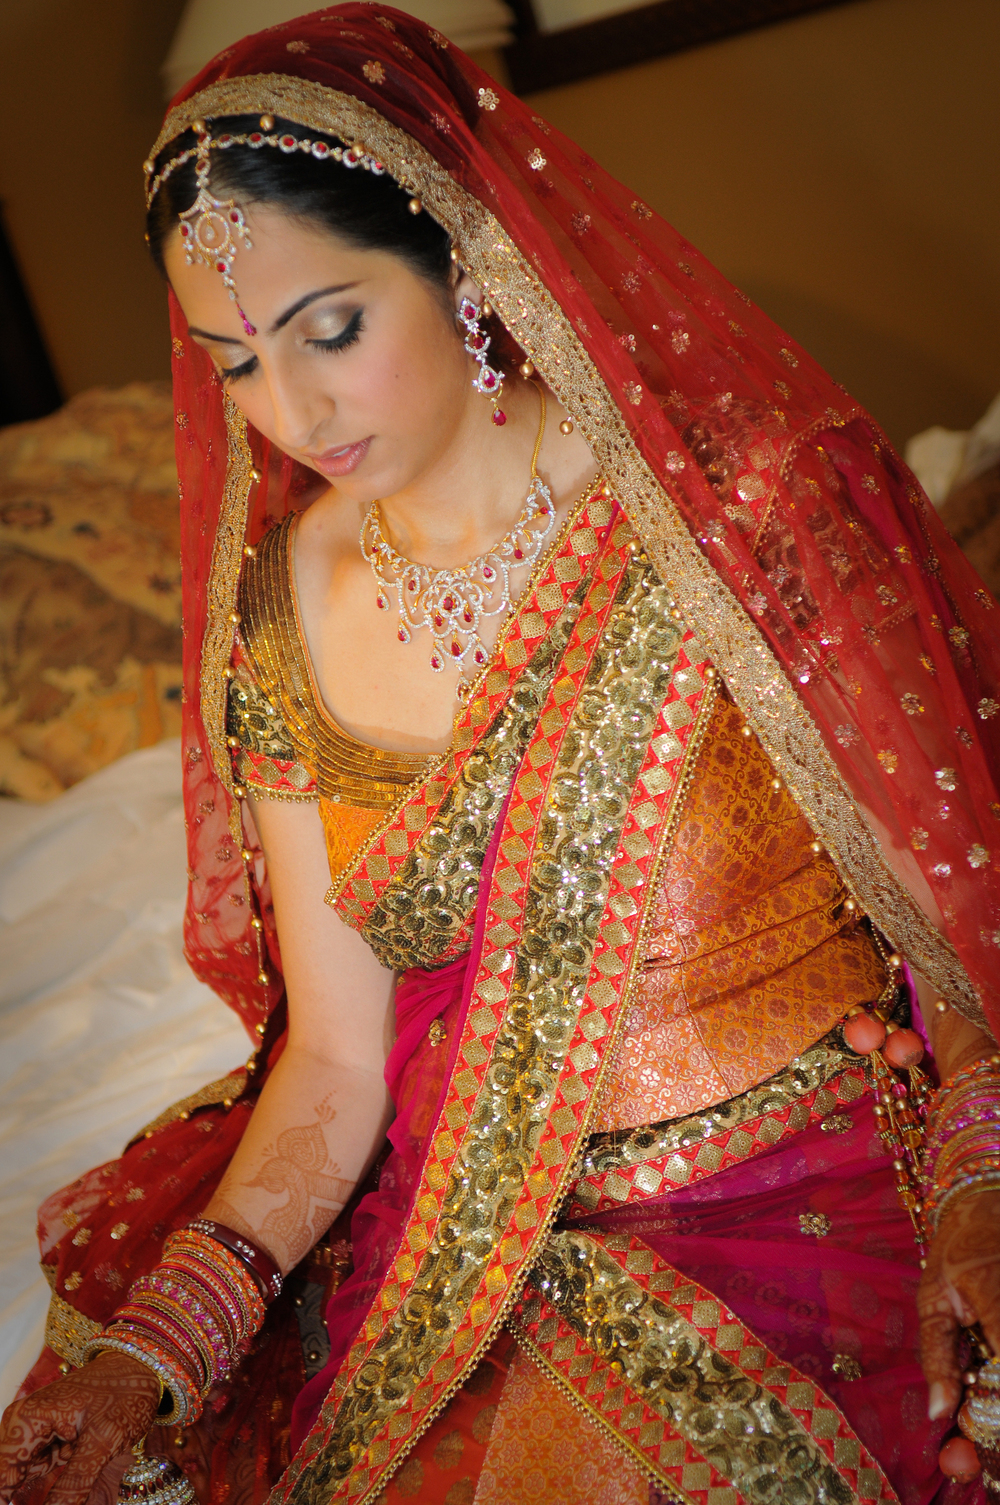 bridal-hair-makeup-indian-bride-bollywood-ethnic-makeup-hair.jpg